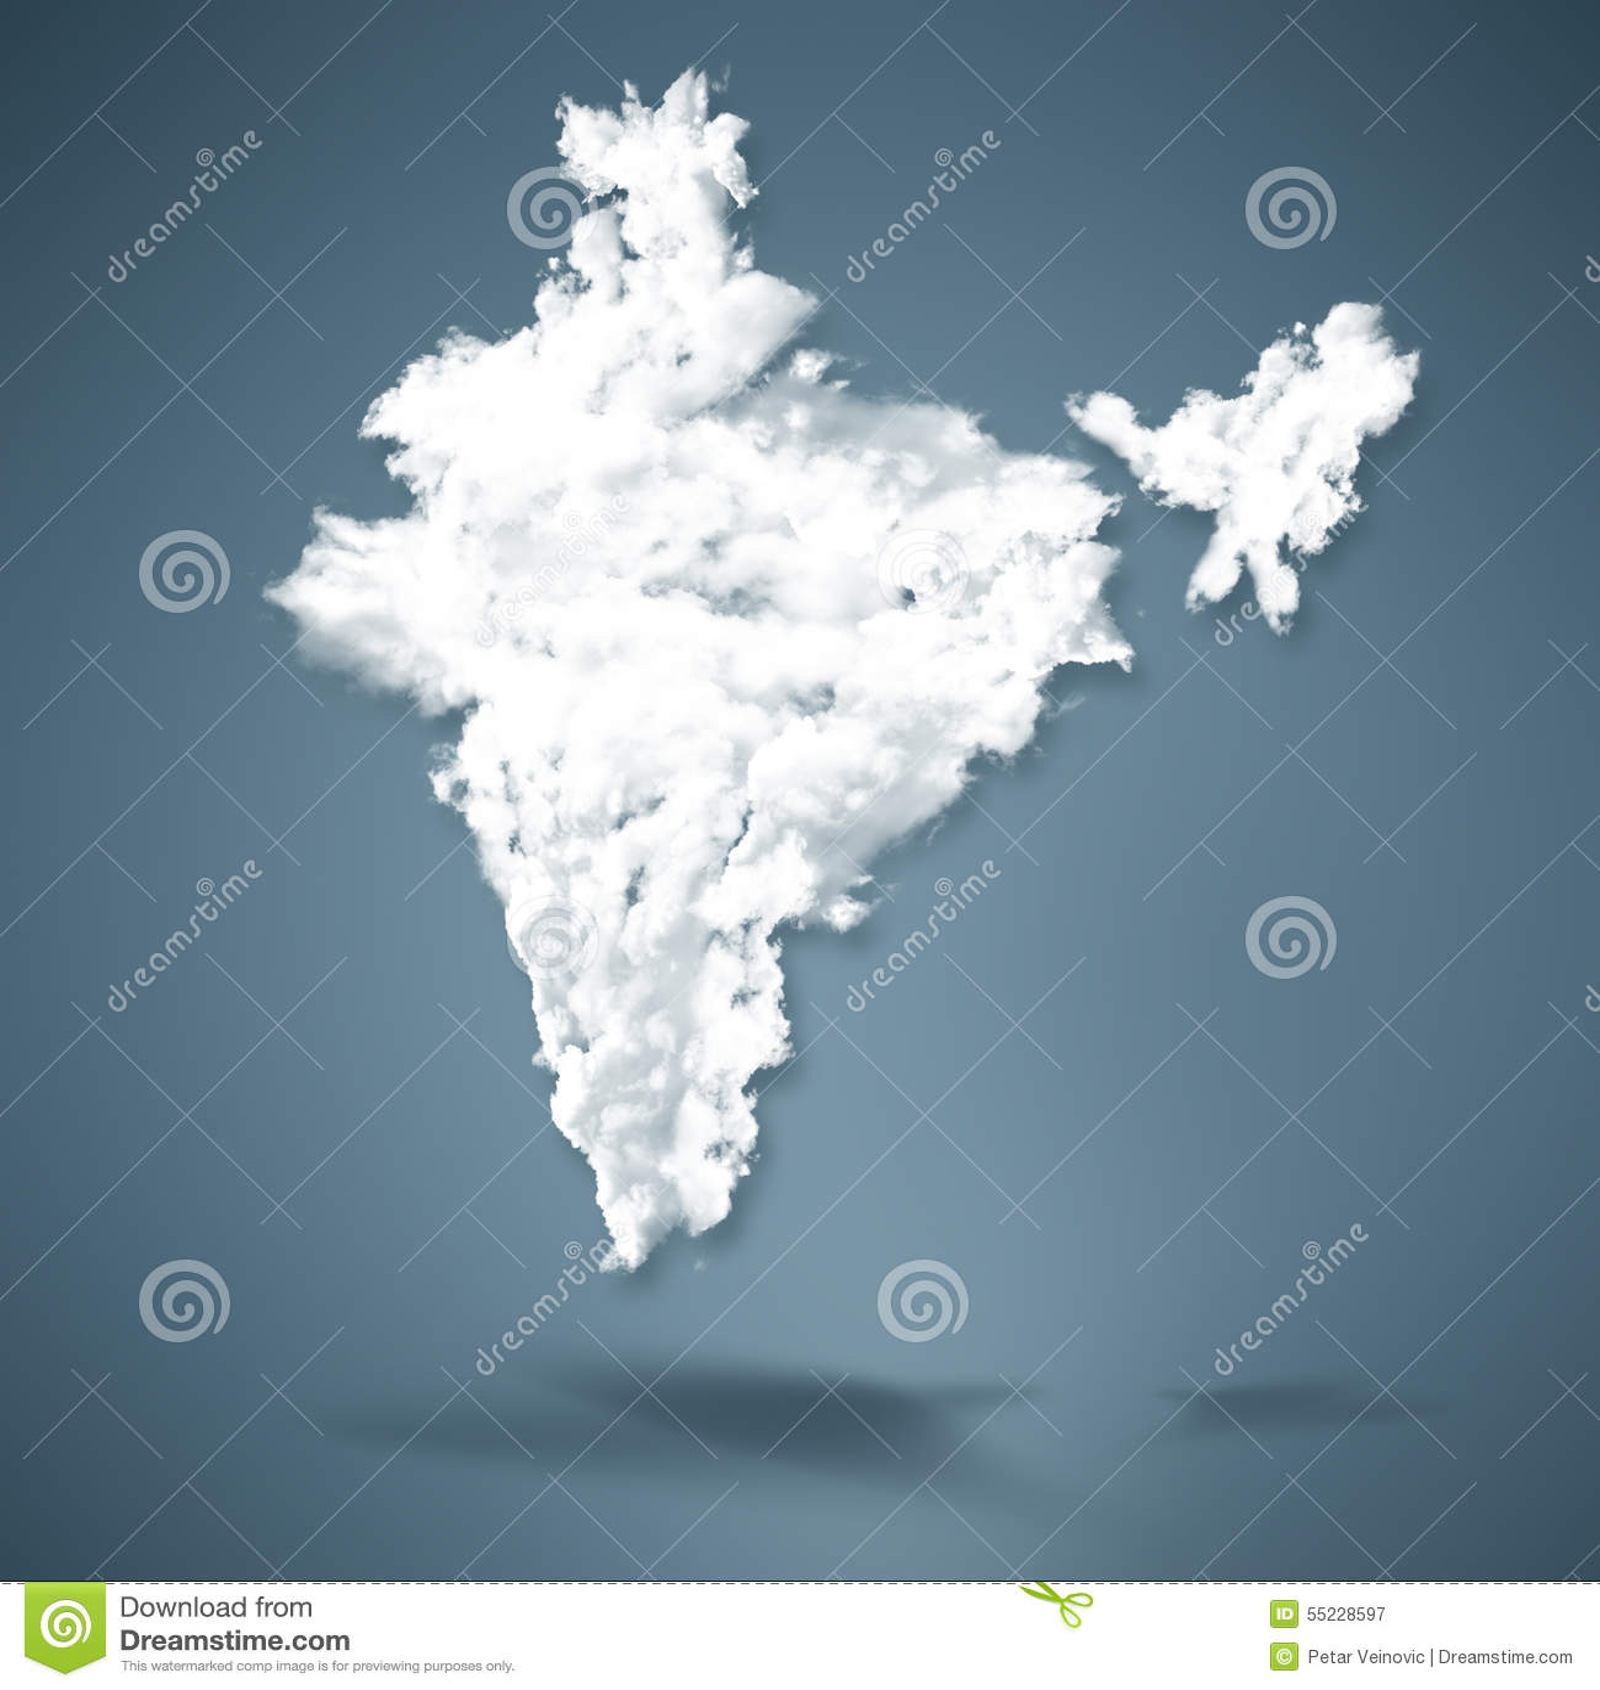 Cloud Map India India Map stock illustration. Illustration of network   55228597